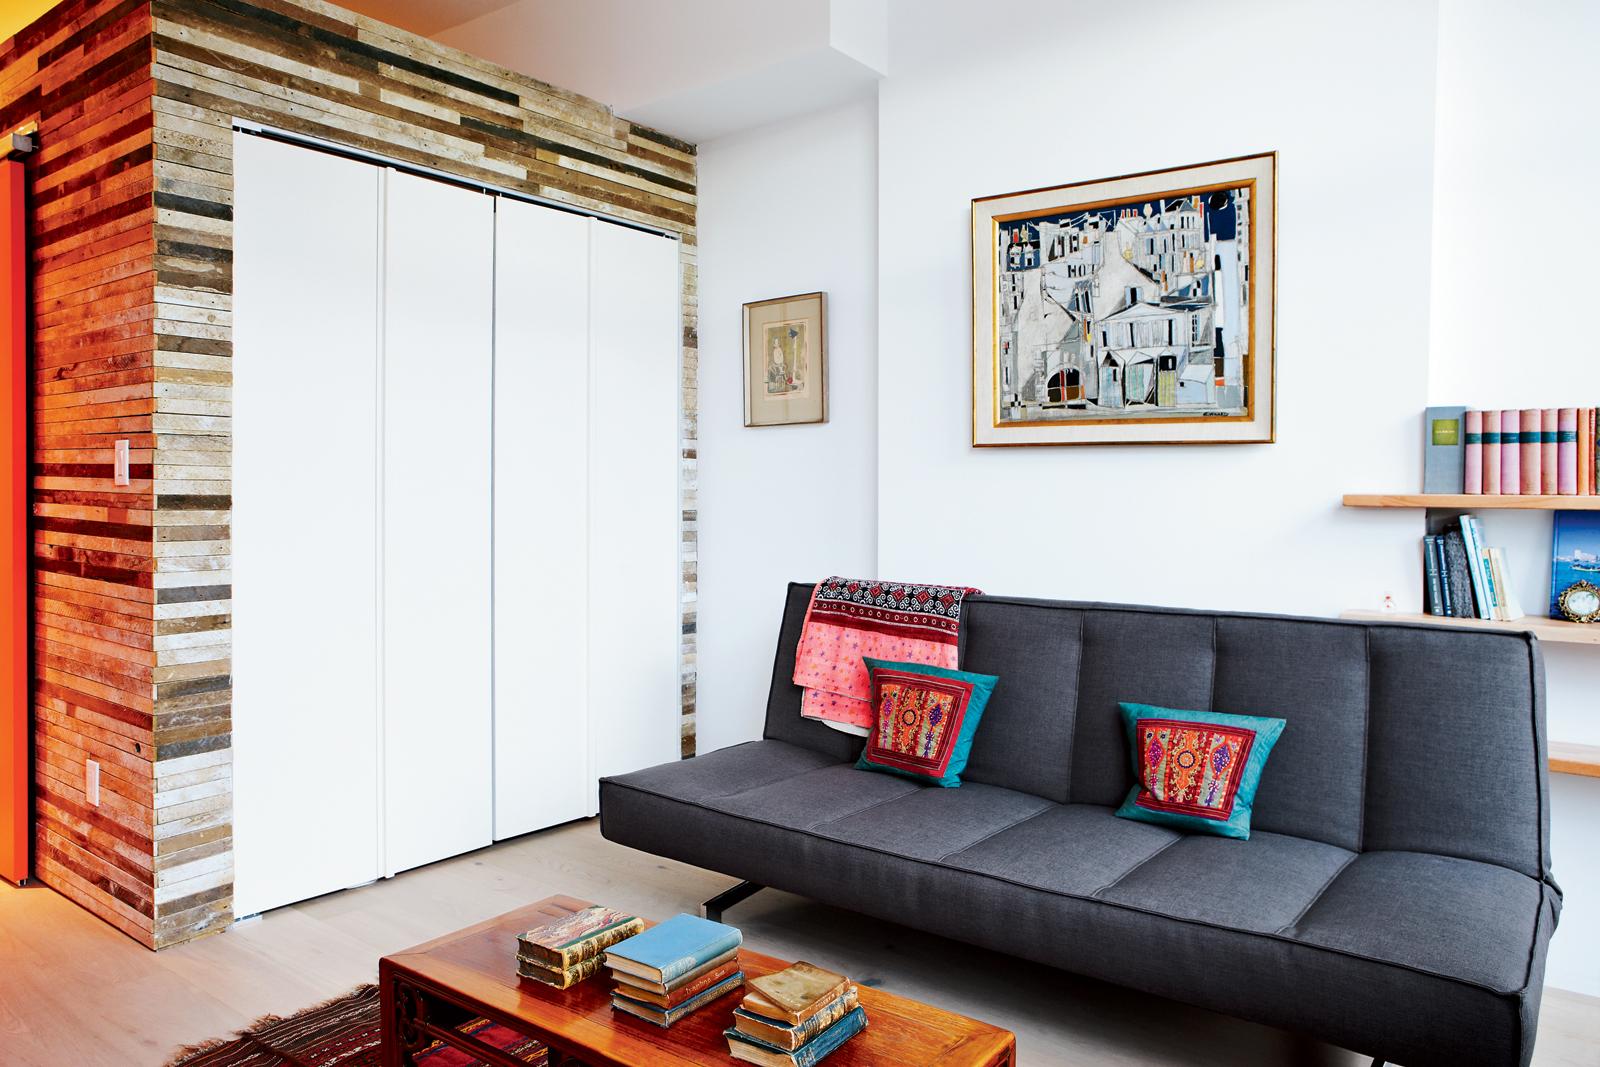 Second floor lounge room with sleeper sofa